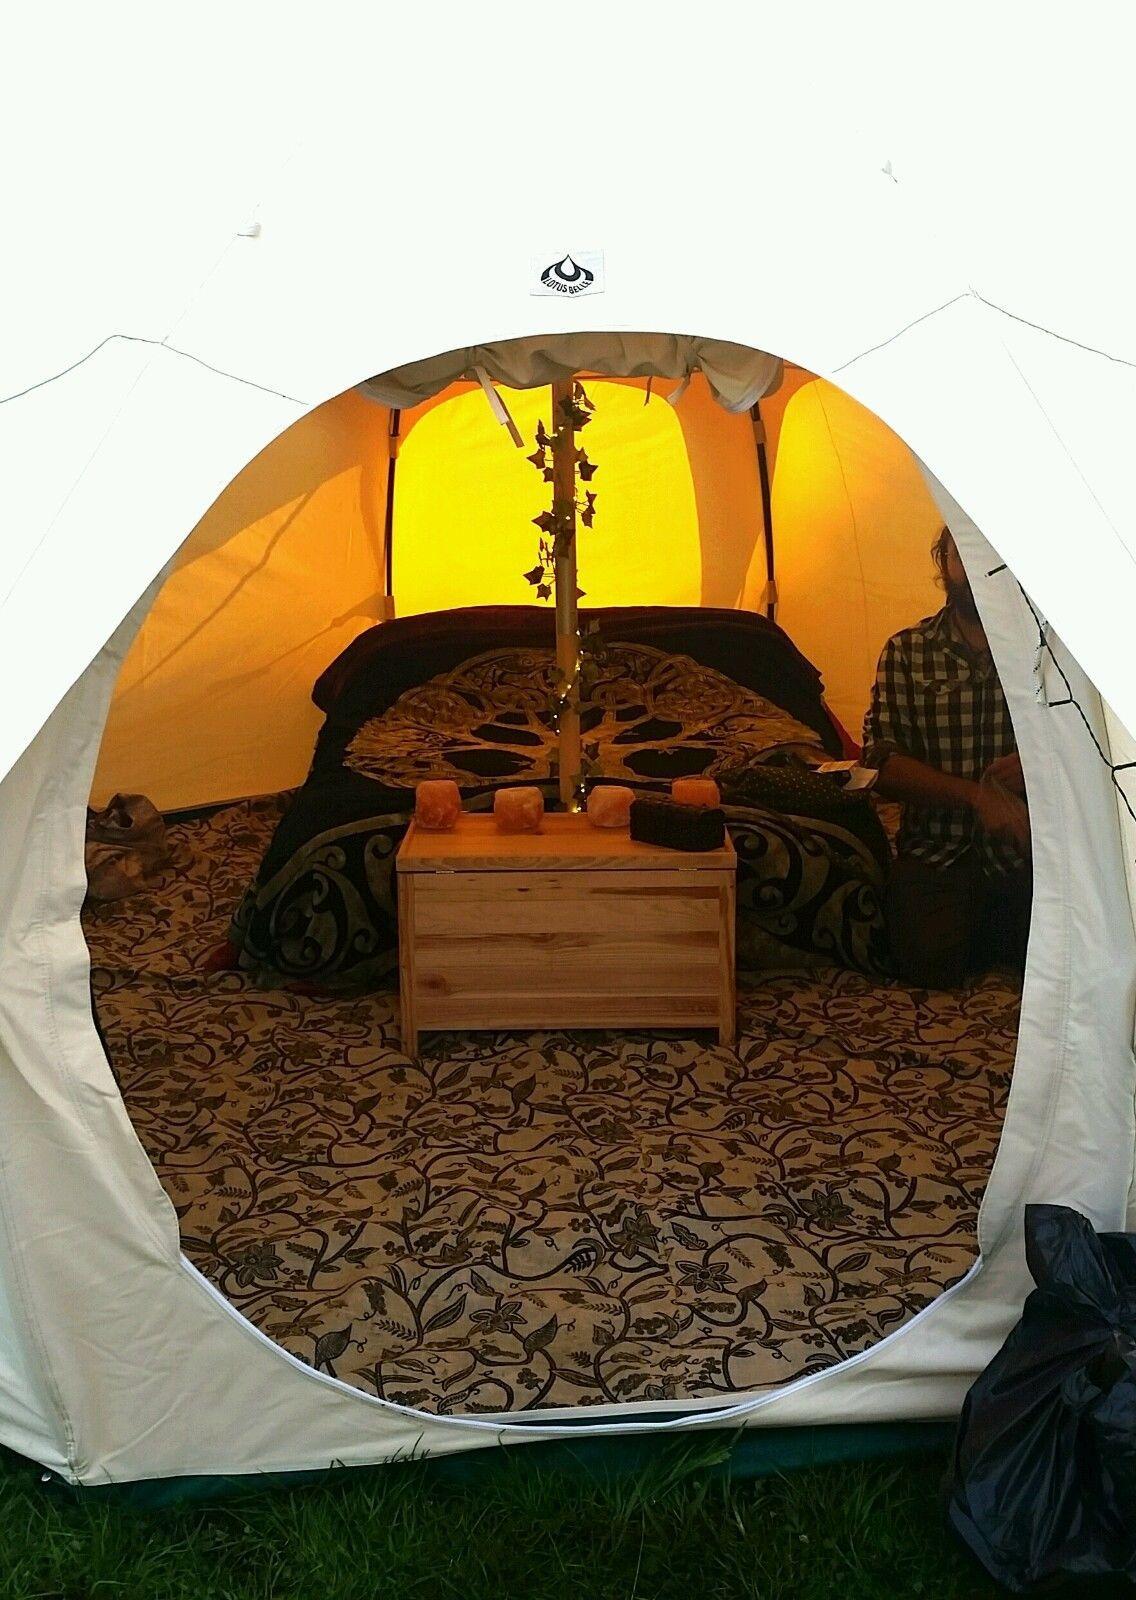 5m Bell Tent Flooring Matting Carpet Rugs Gl&ing Accessories & 5m Bell Tent Flooring Matting Carpet Rugs Glamping Accessories | Tents